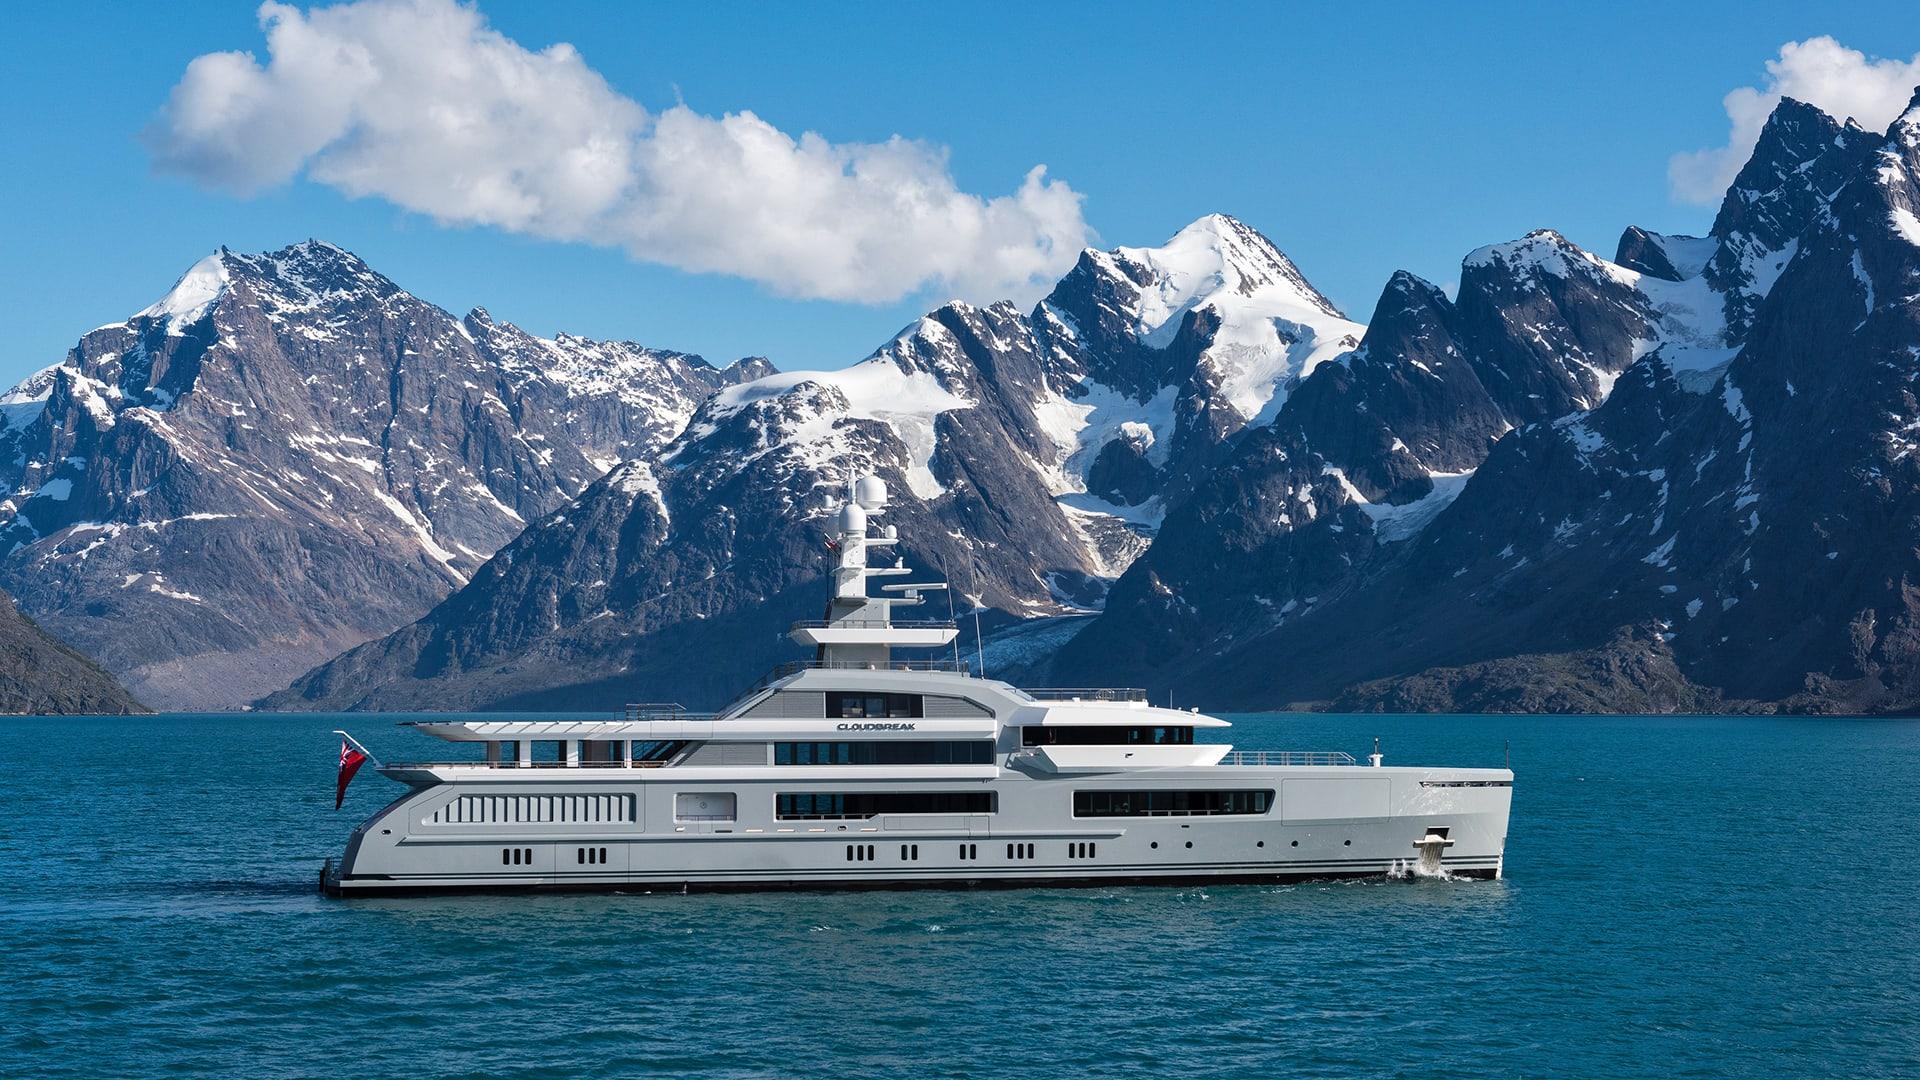 ABEKING & RASMUSSEN CLOUDBREAK 75 Meters charter rental For Super Rich